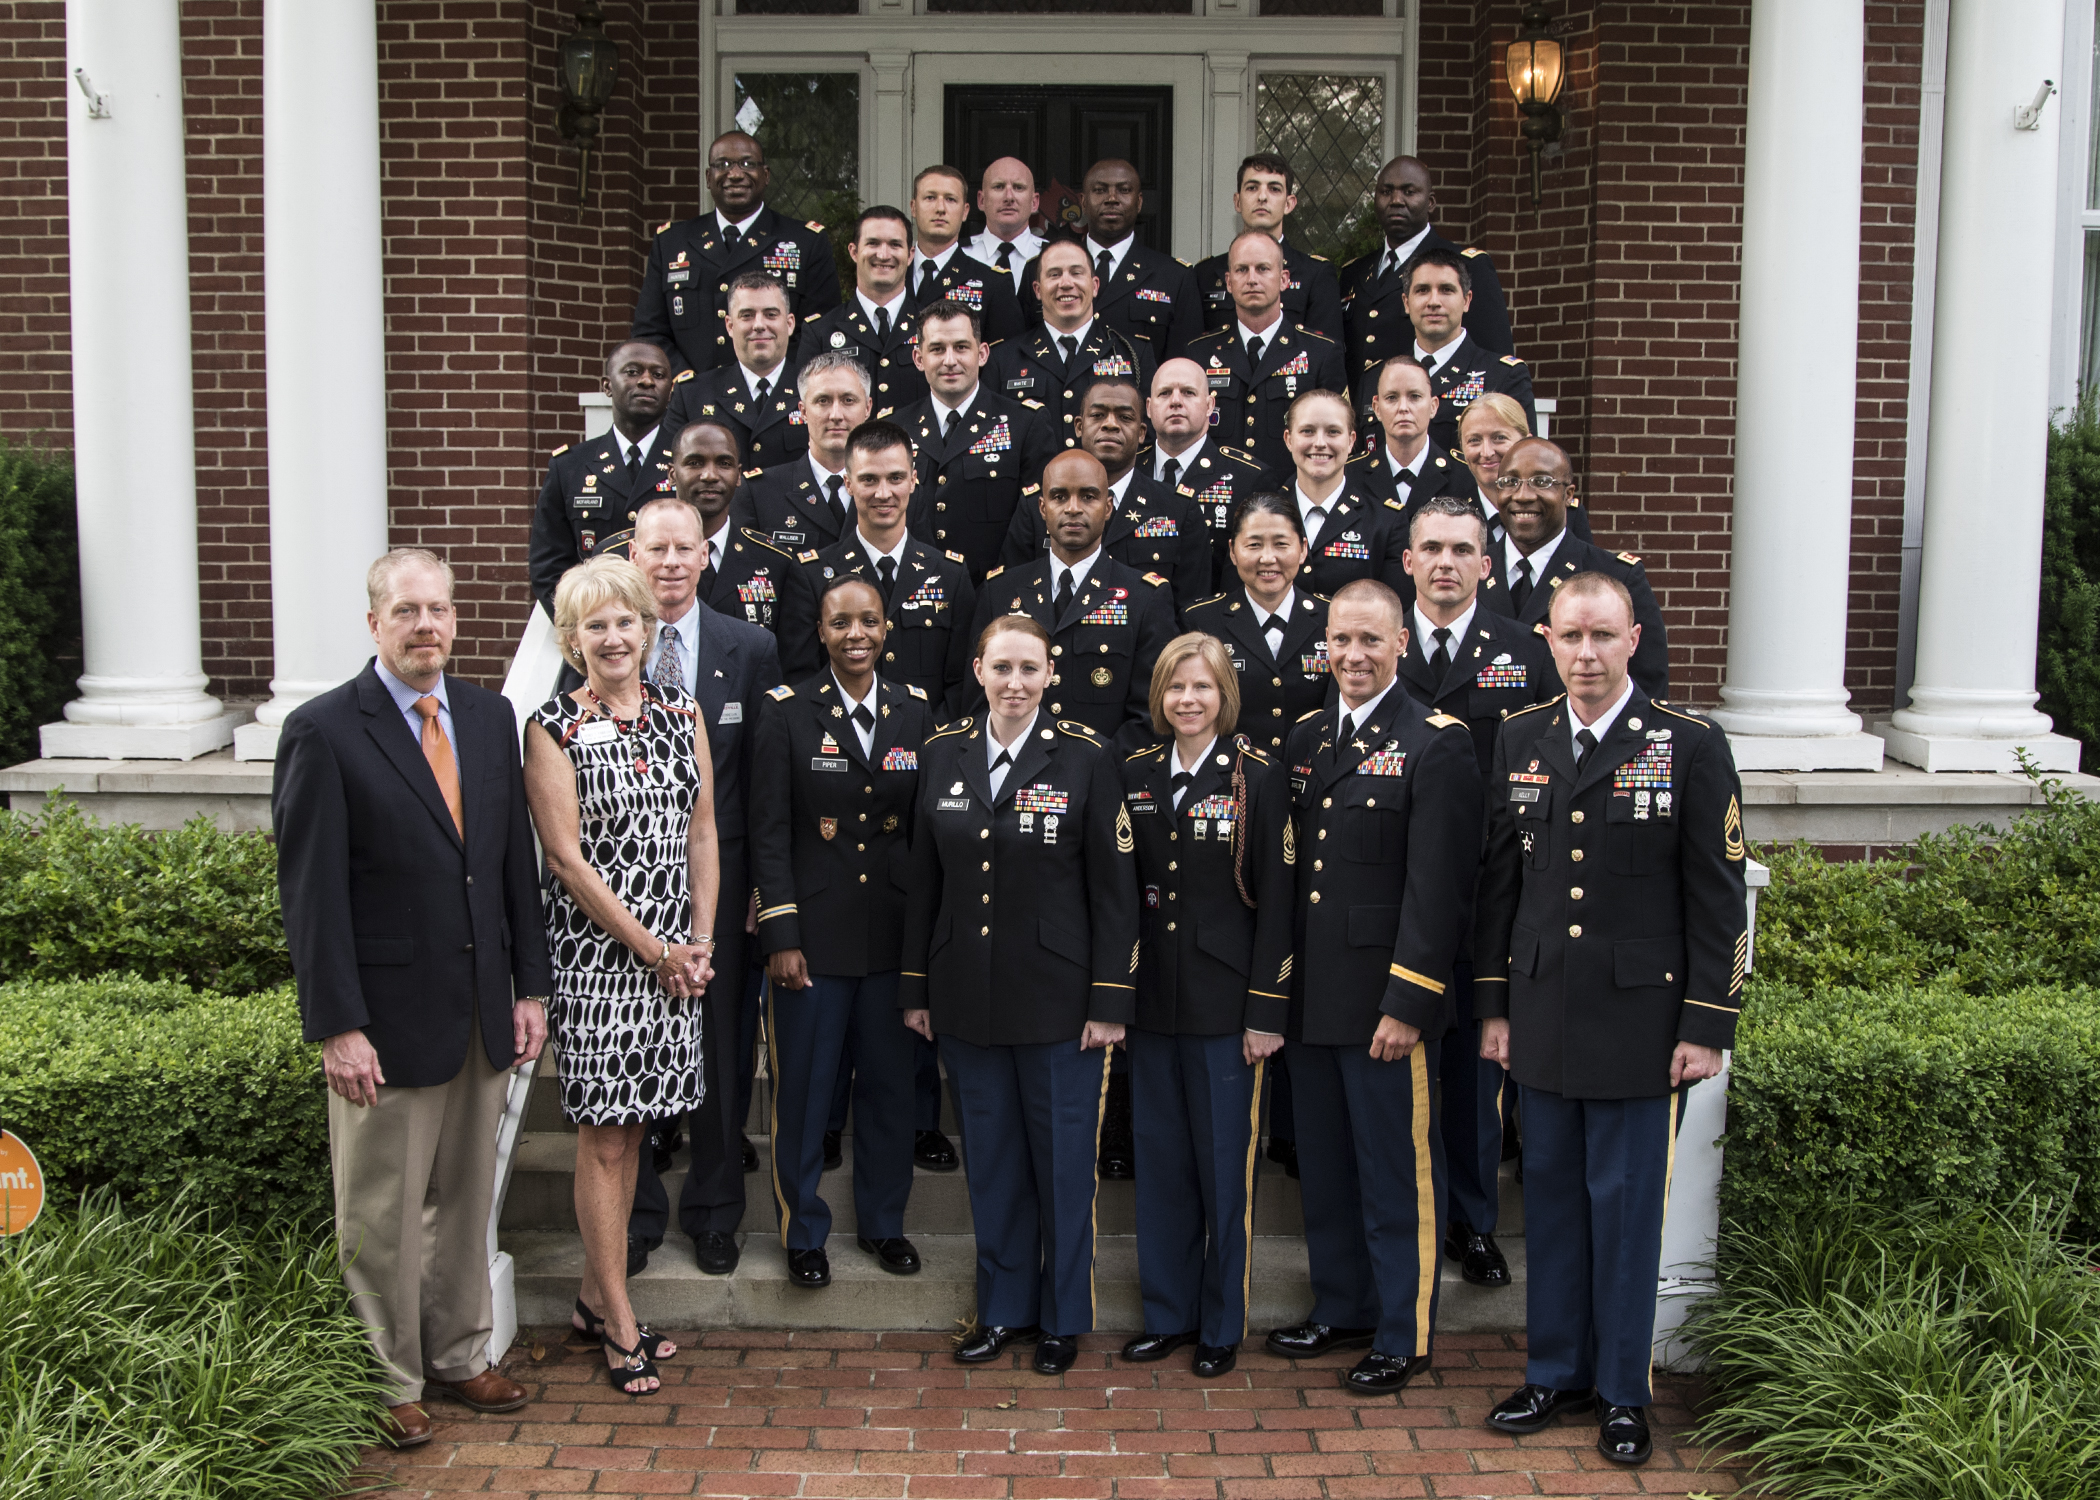 McConnell Center's Strategic Broadening Seminar announces 2016 graduates